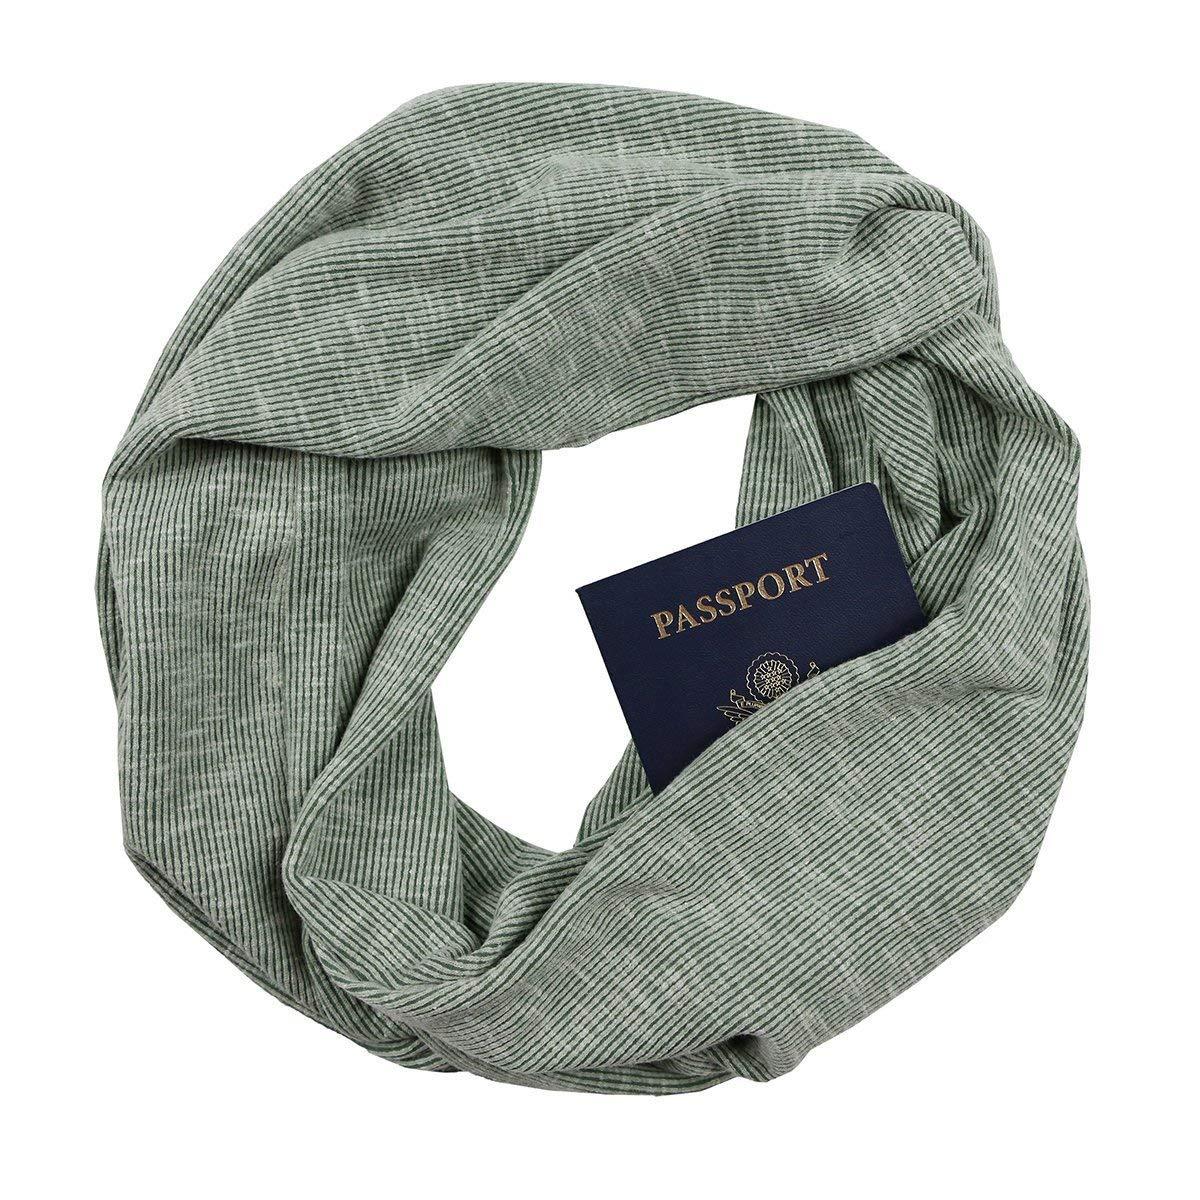 Olive Rib Knit Infinity Scarf with Zippered Secret Pocket